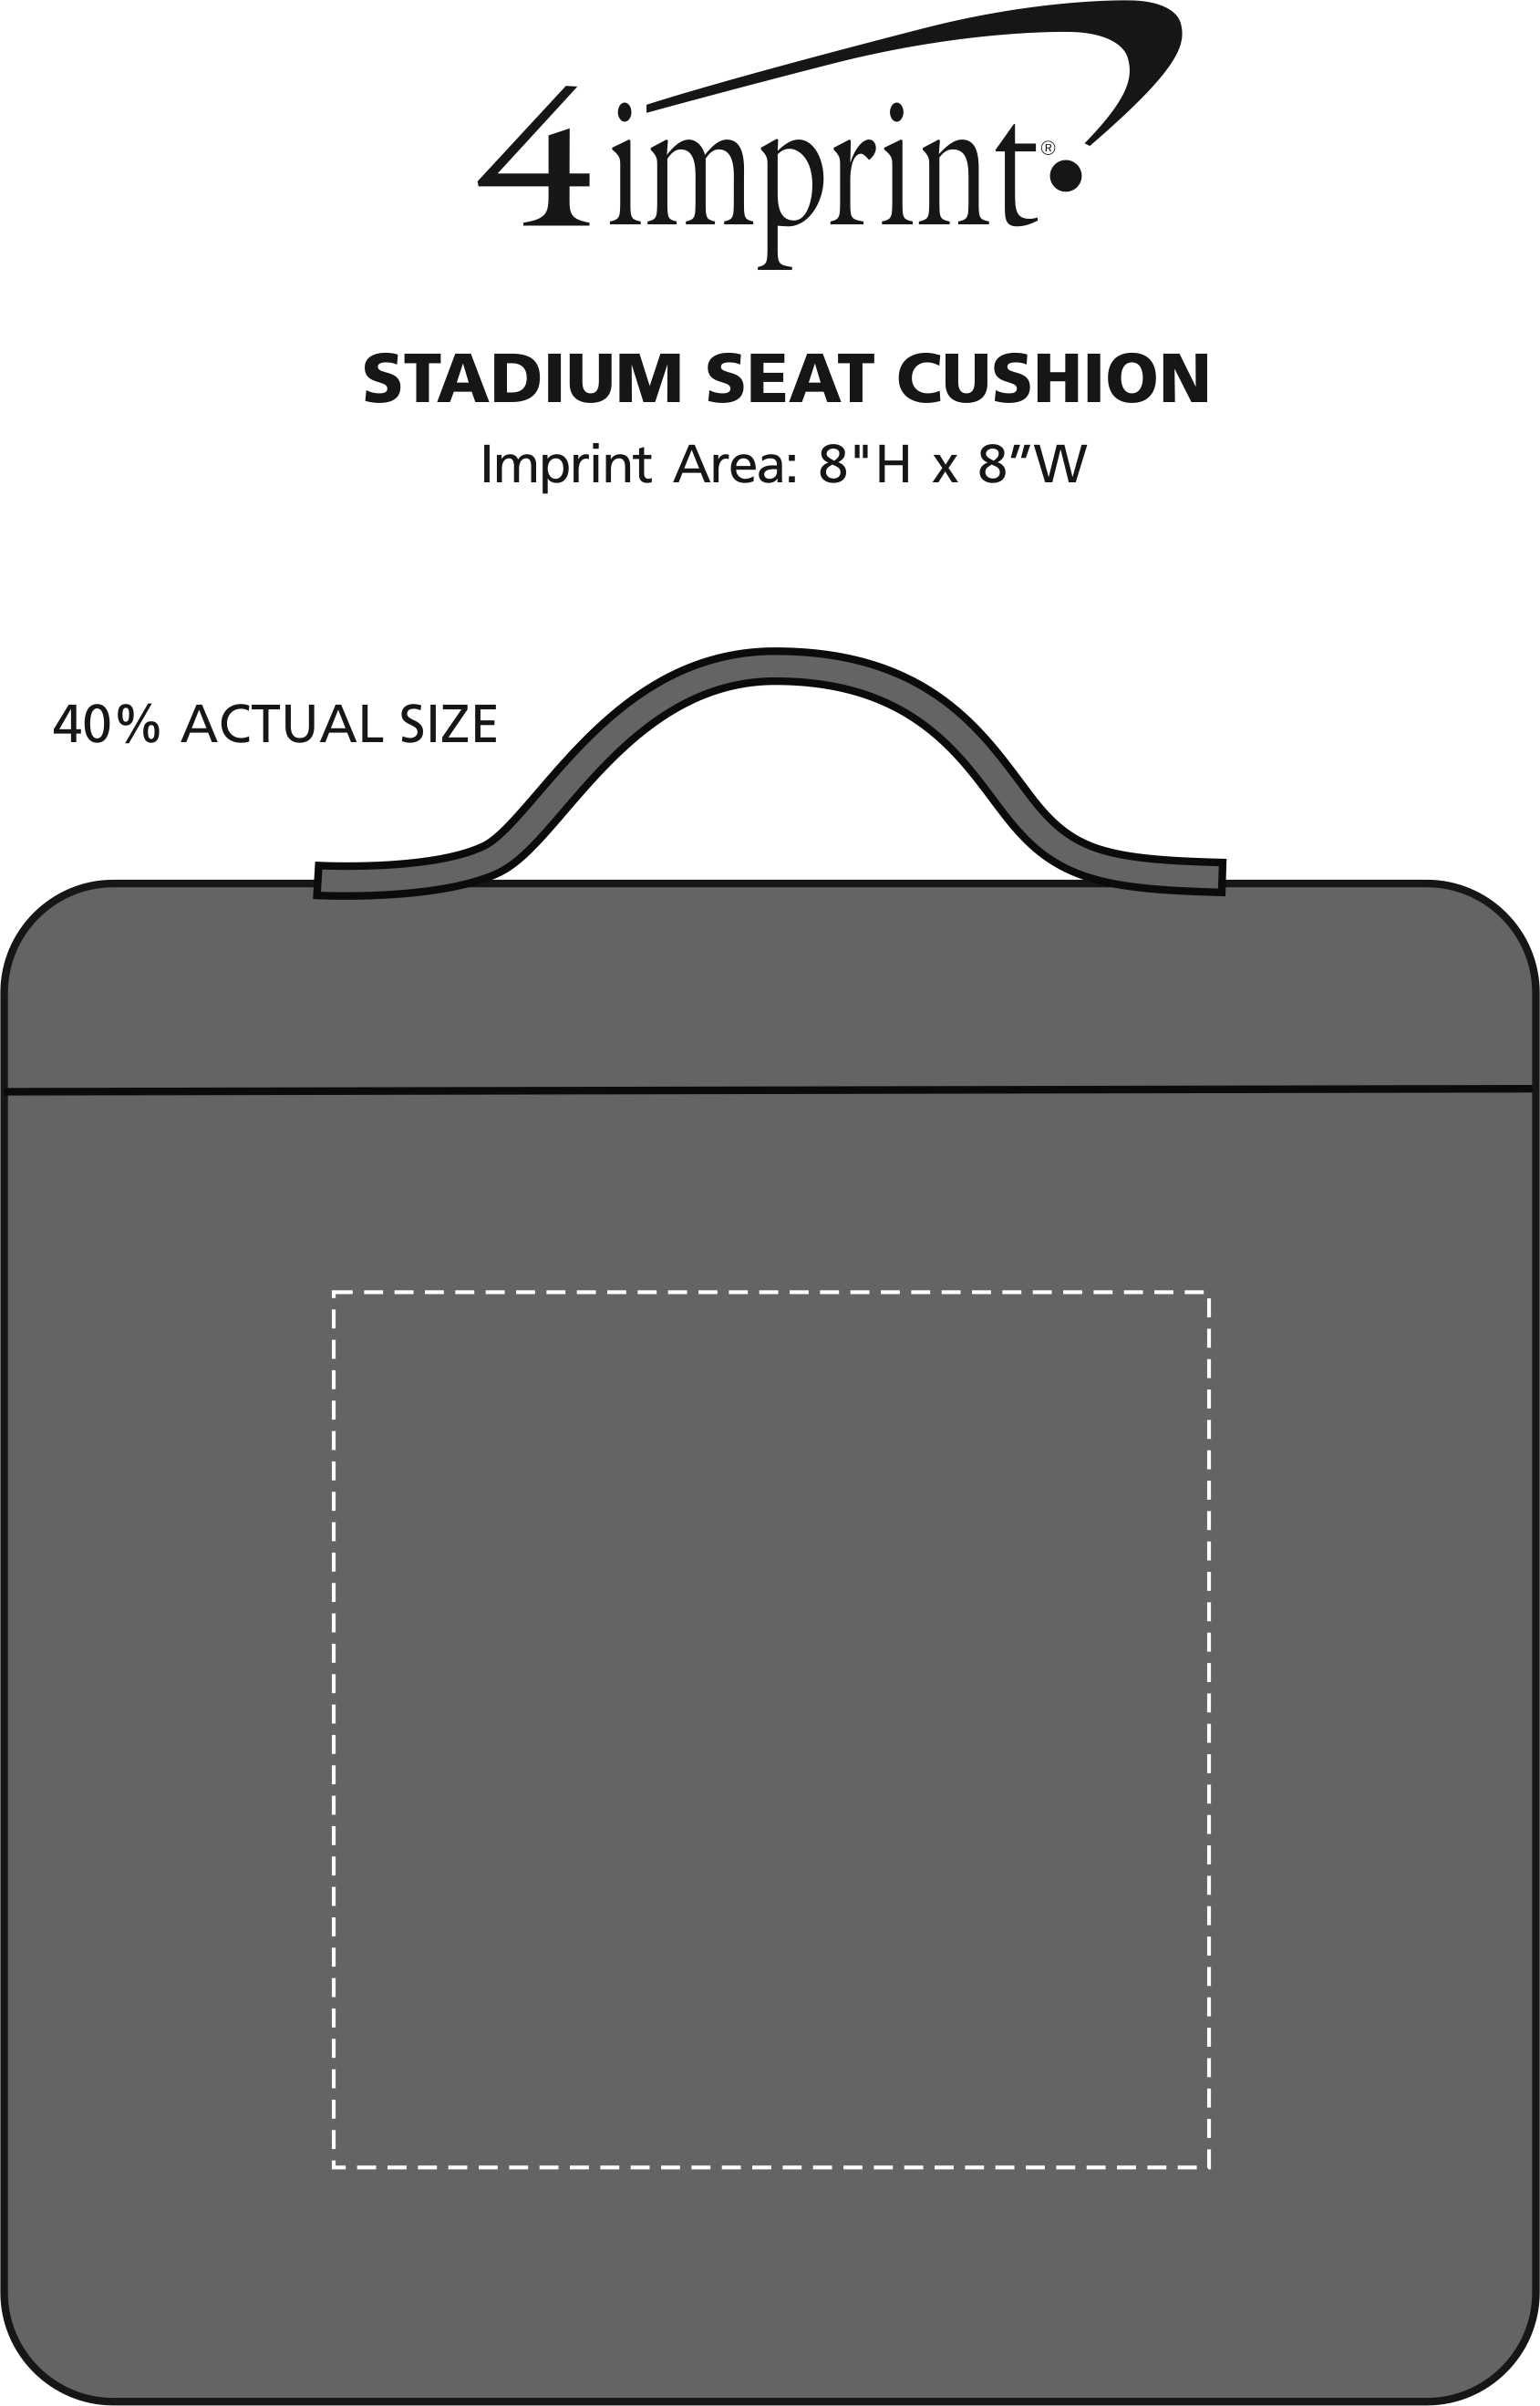 Imprint Area of Stadium Seat Cushion